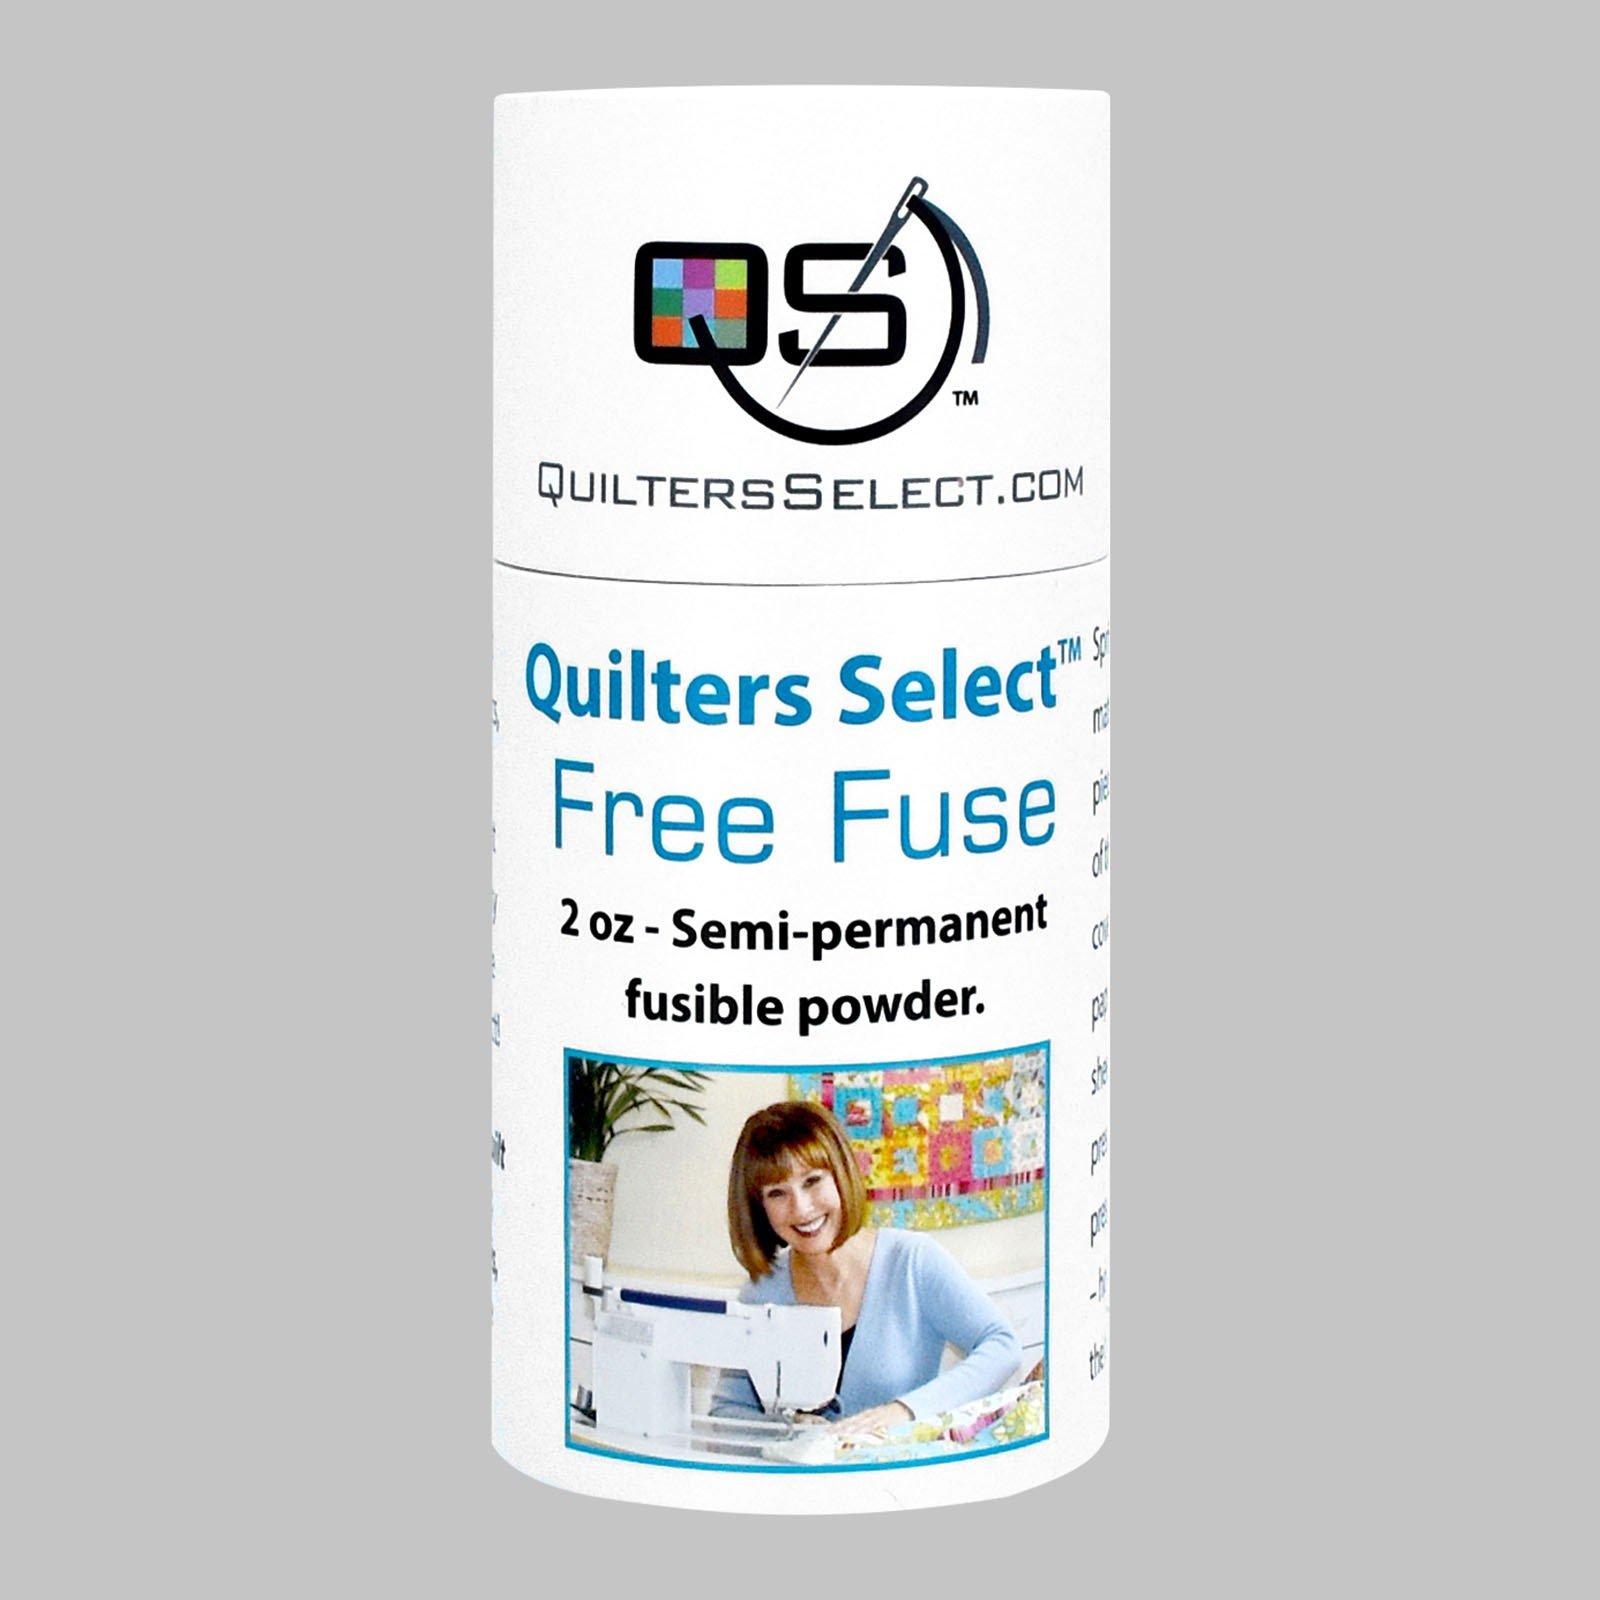 Quilters Select Free Fuse 2oz Sprinkler - QSEQS-FF2OZ